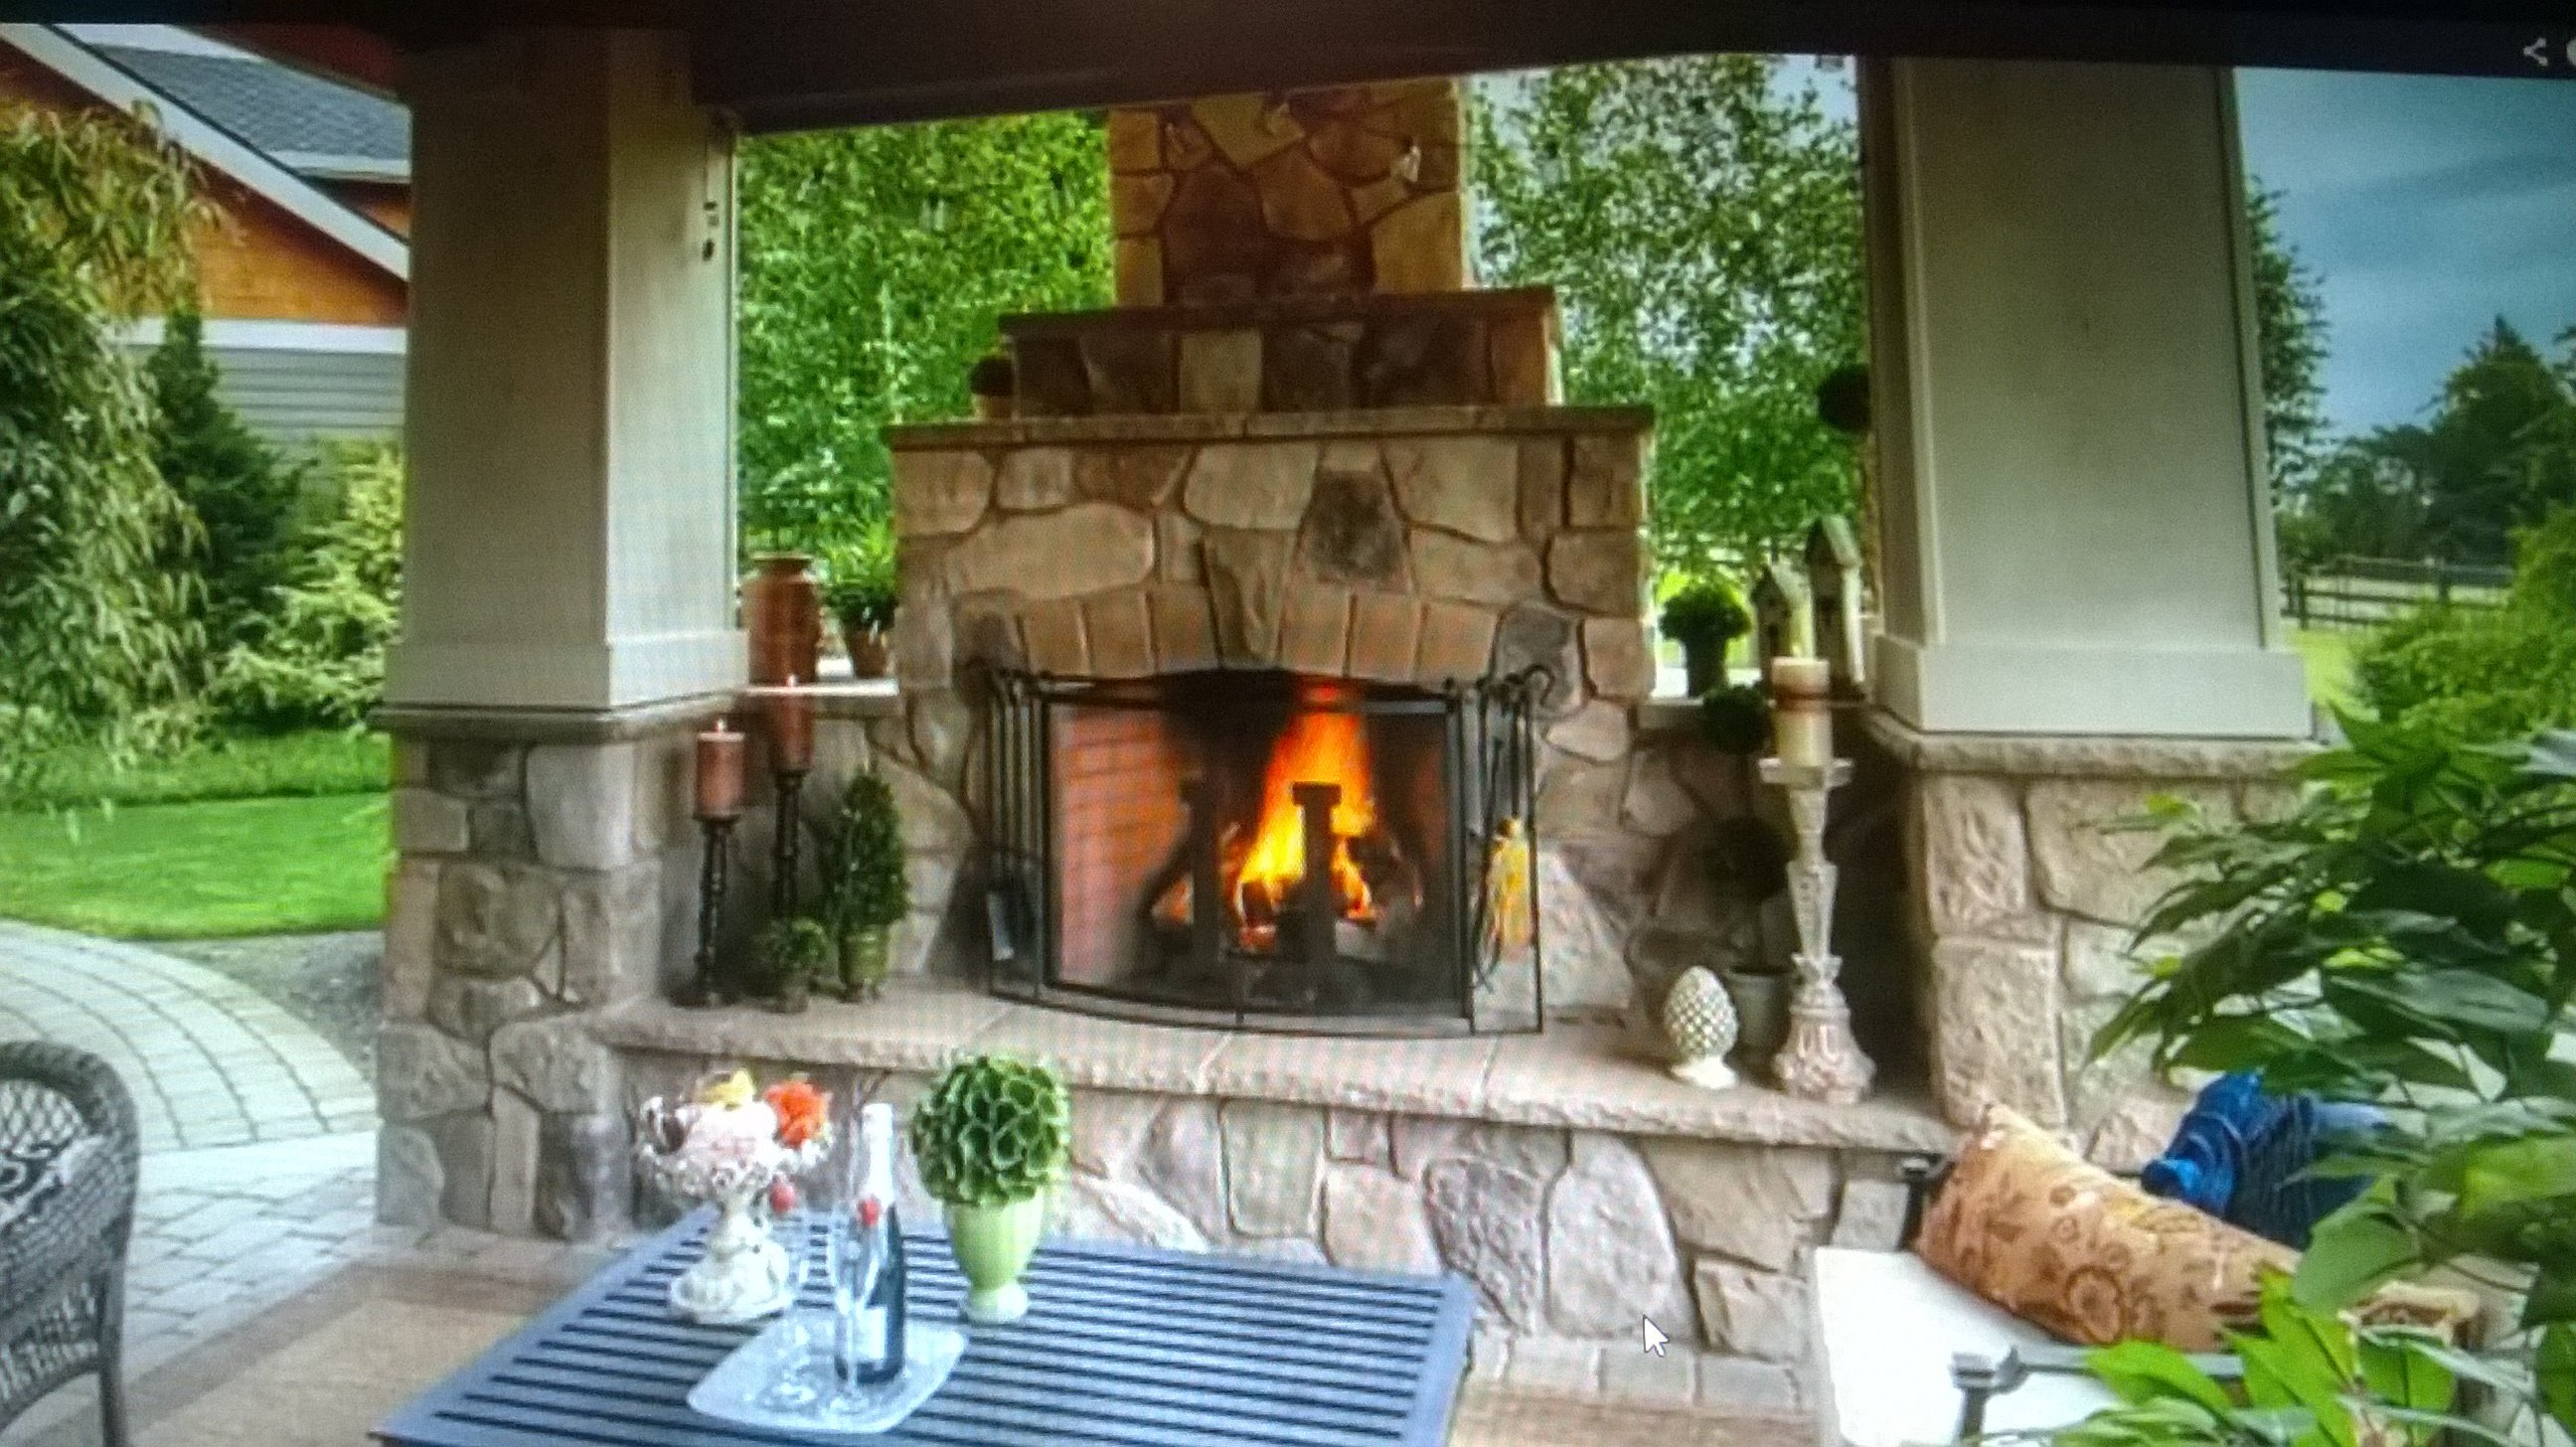 Backyards N More | Custom Outdoor Kitchens & Fireplaces ... on Custom Backyards id=31590